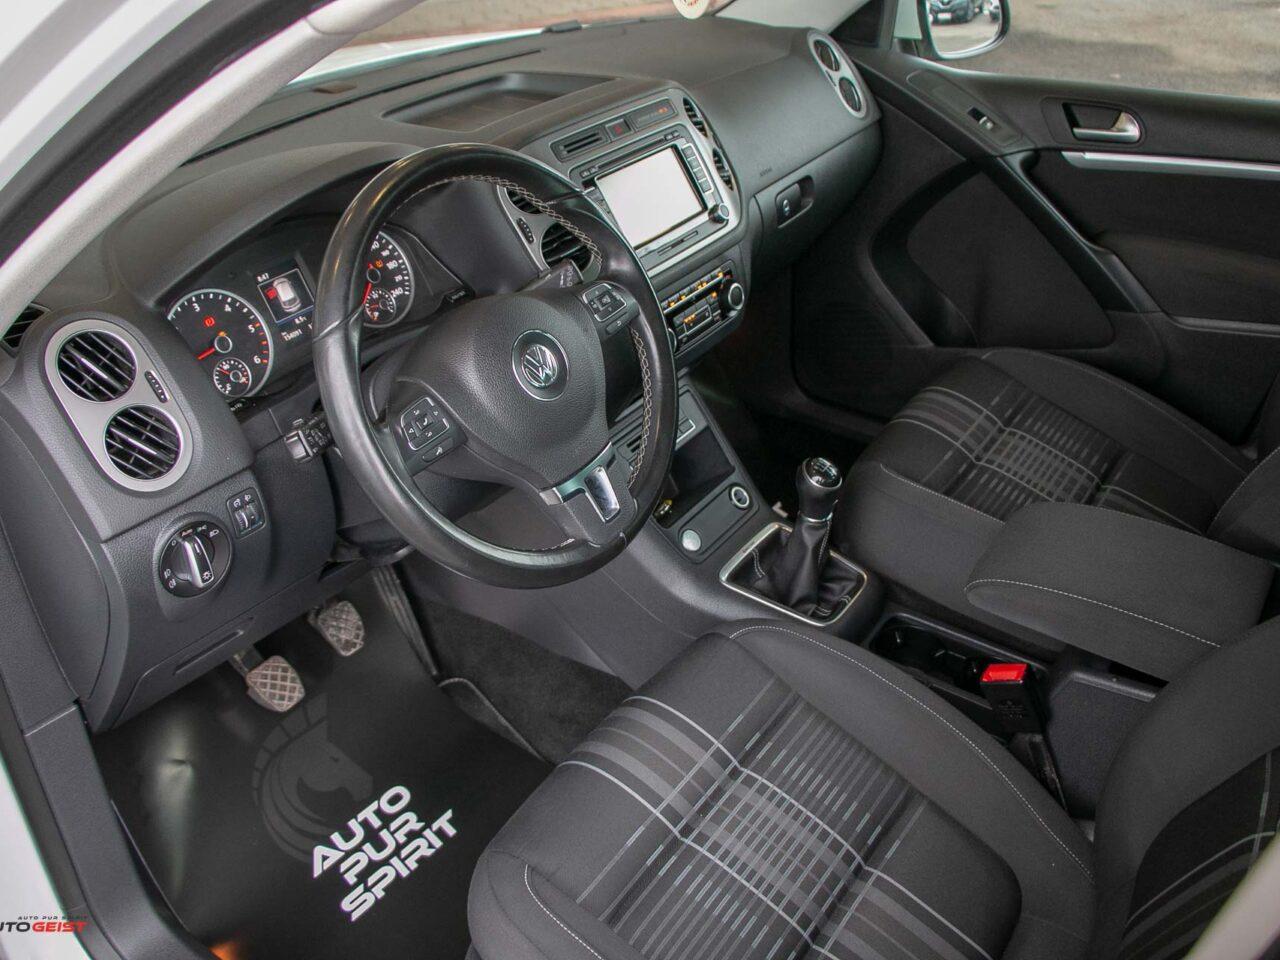 VW-TIGUAN-2015-manual-3480